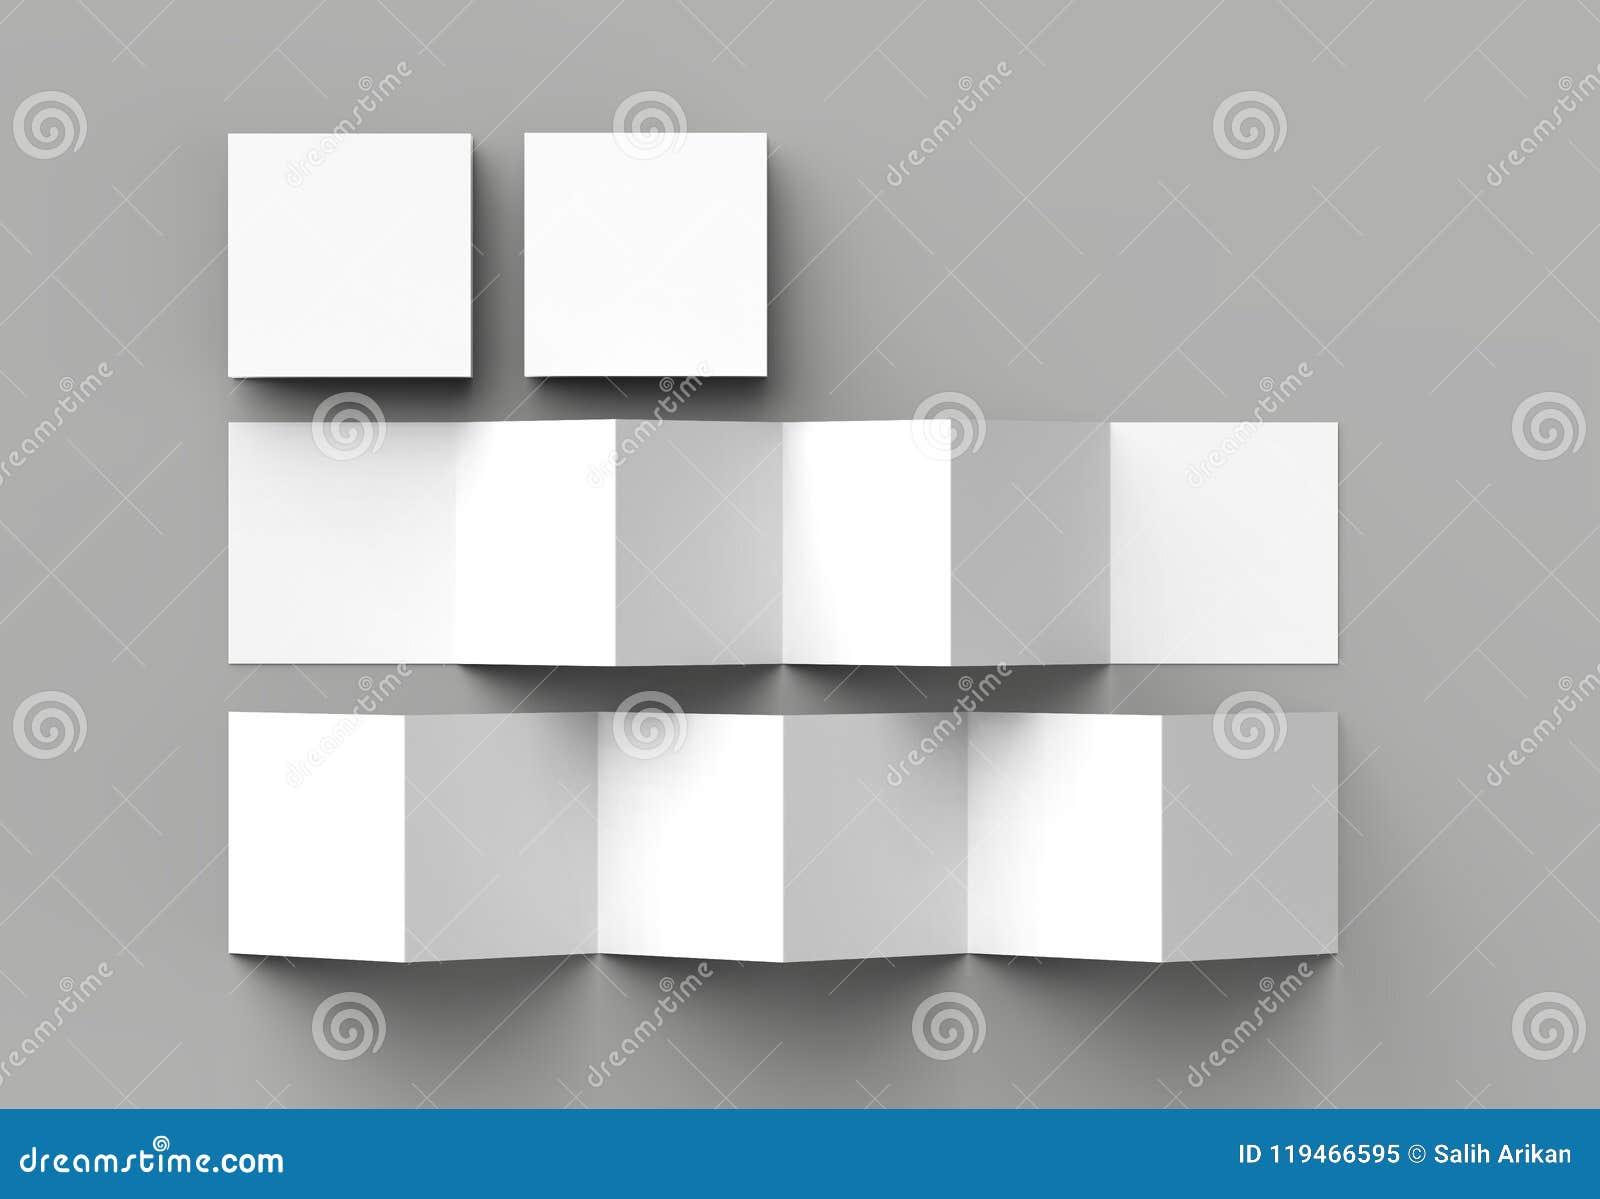 12 page leaflet, 6 panel accordion fold - Z fold square brochure